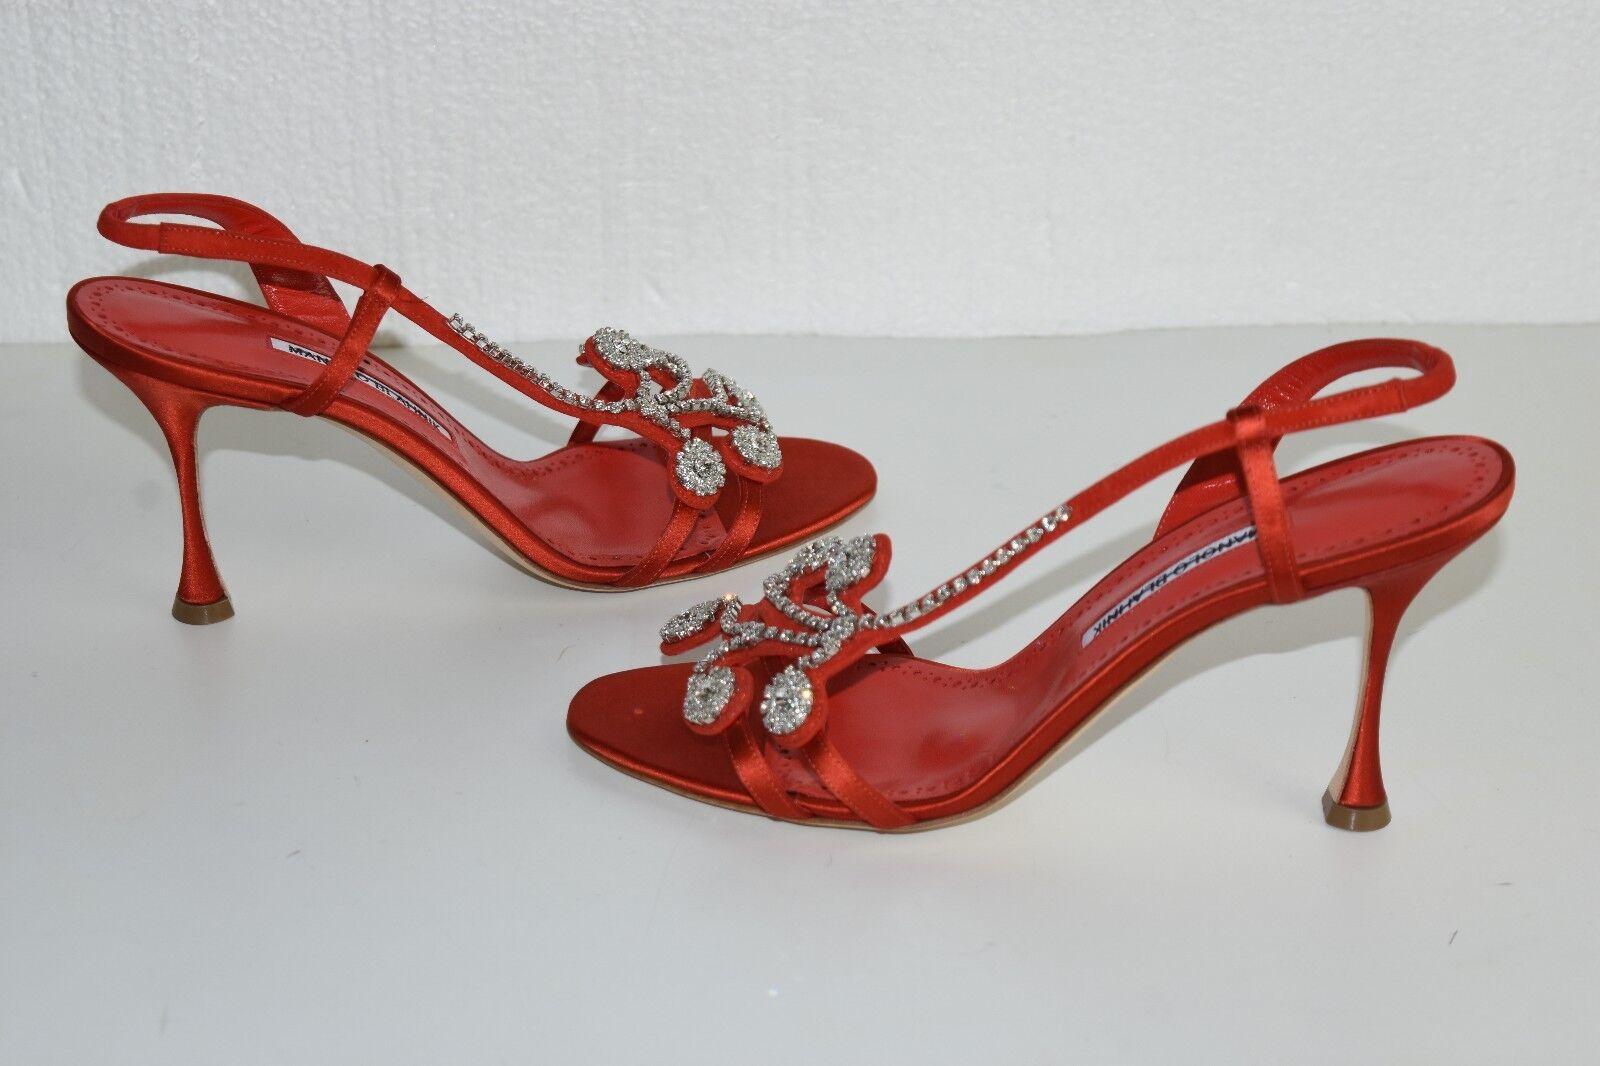 1395 New MANOLO BLAHNIK Fernusan 90 Jeweled Red Satin SANDALS Heels SHOES 40.5